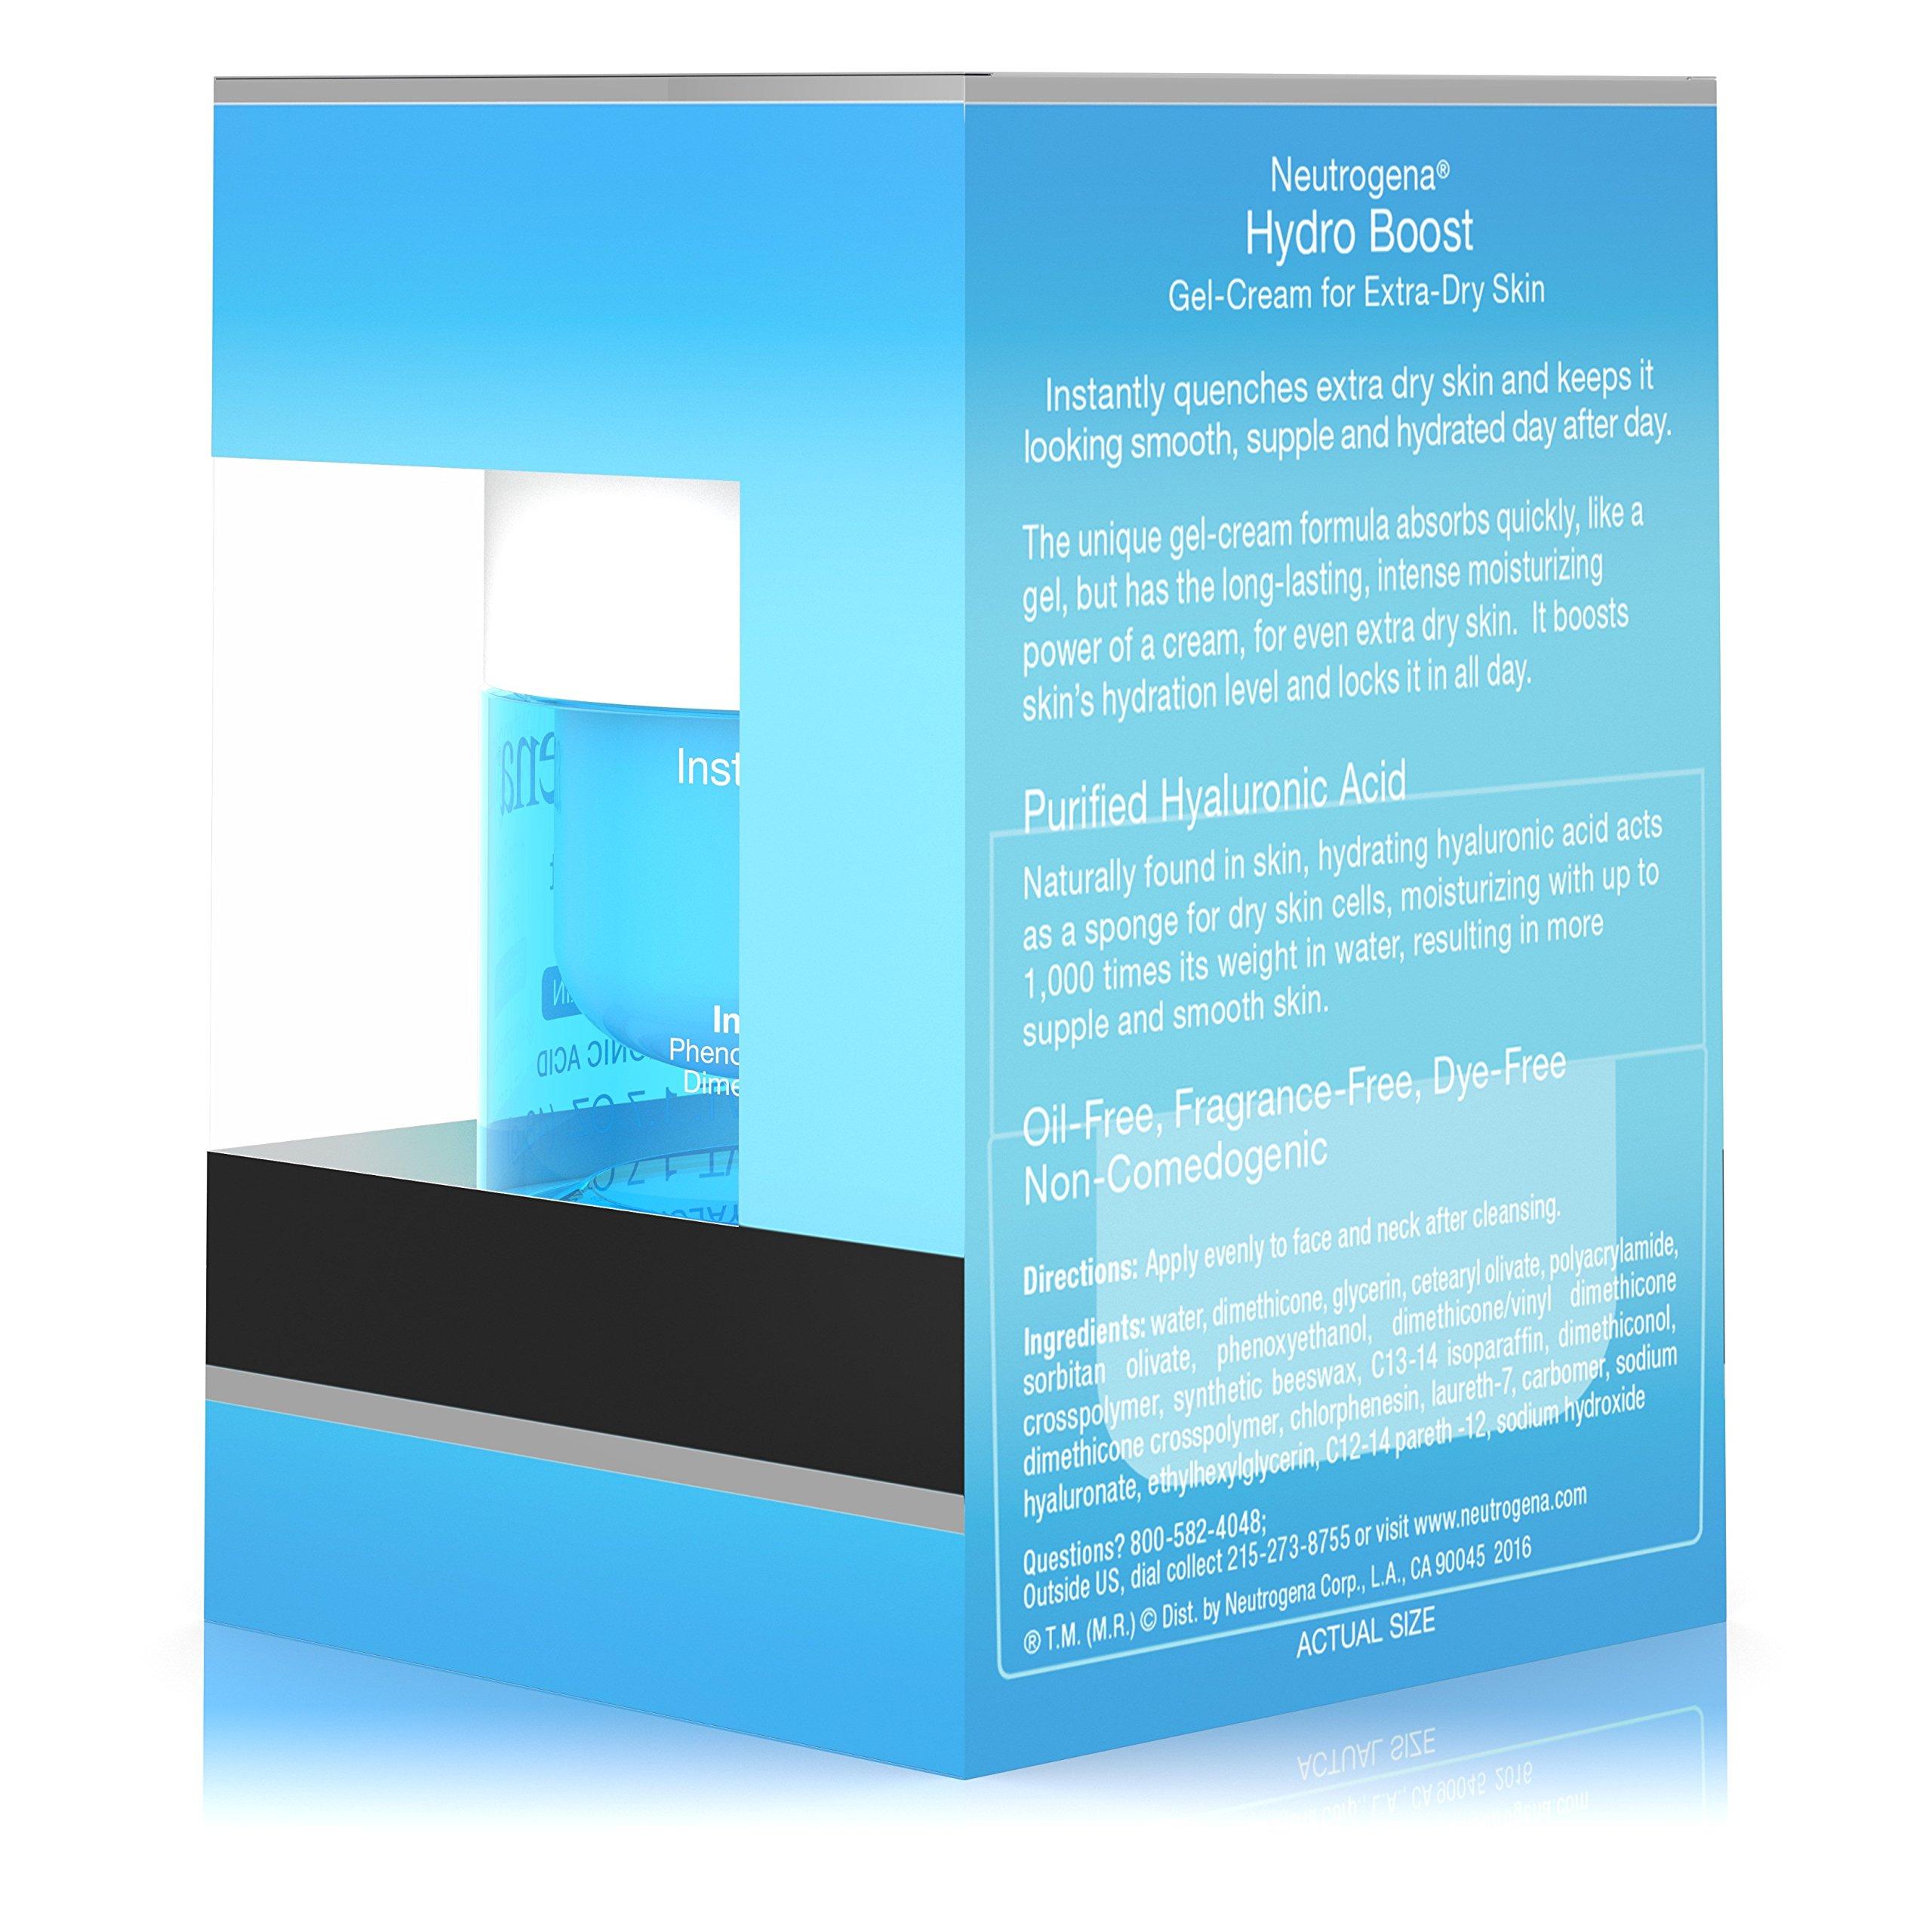 Neutrogena Hydro Boost Hyaluronic Acid Hydrating Face Moisturizer Gel-Cream to Hydrate and Smooth Extra-Dry Skin, 1.7 oz by Neutrogena (Image #10)